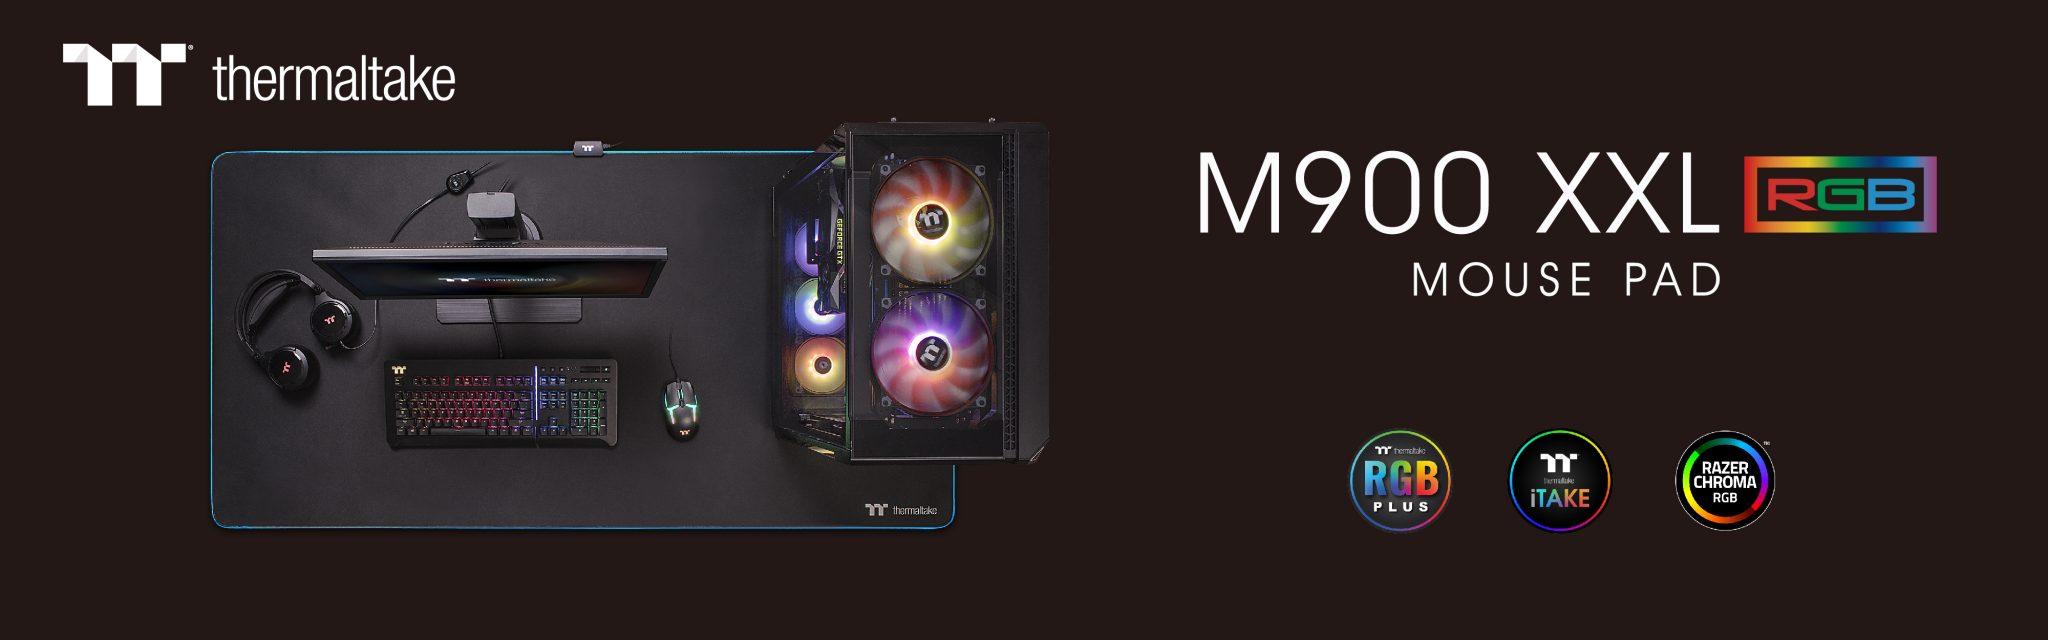 Alfombrilla de ratón Thermaltake M900 XXL RGB - NdP